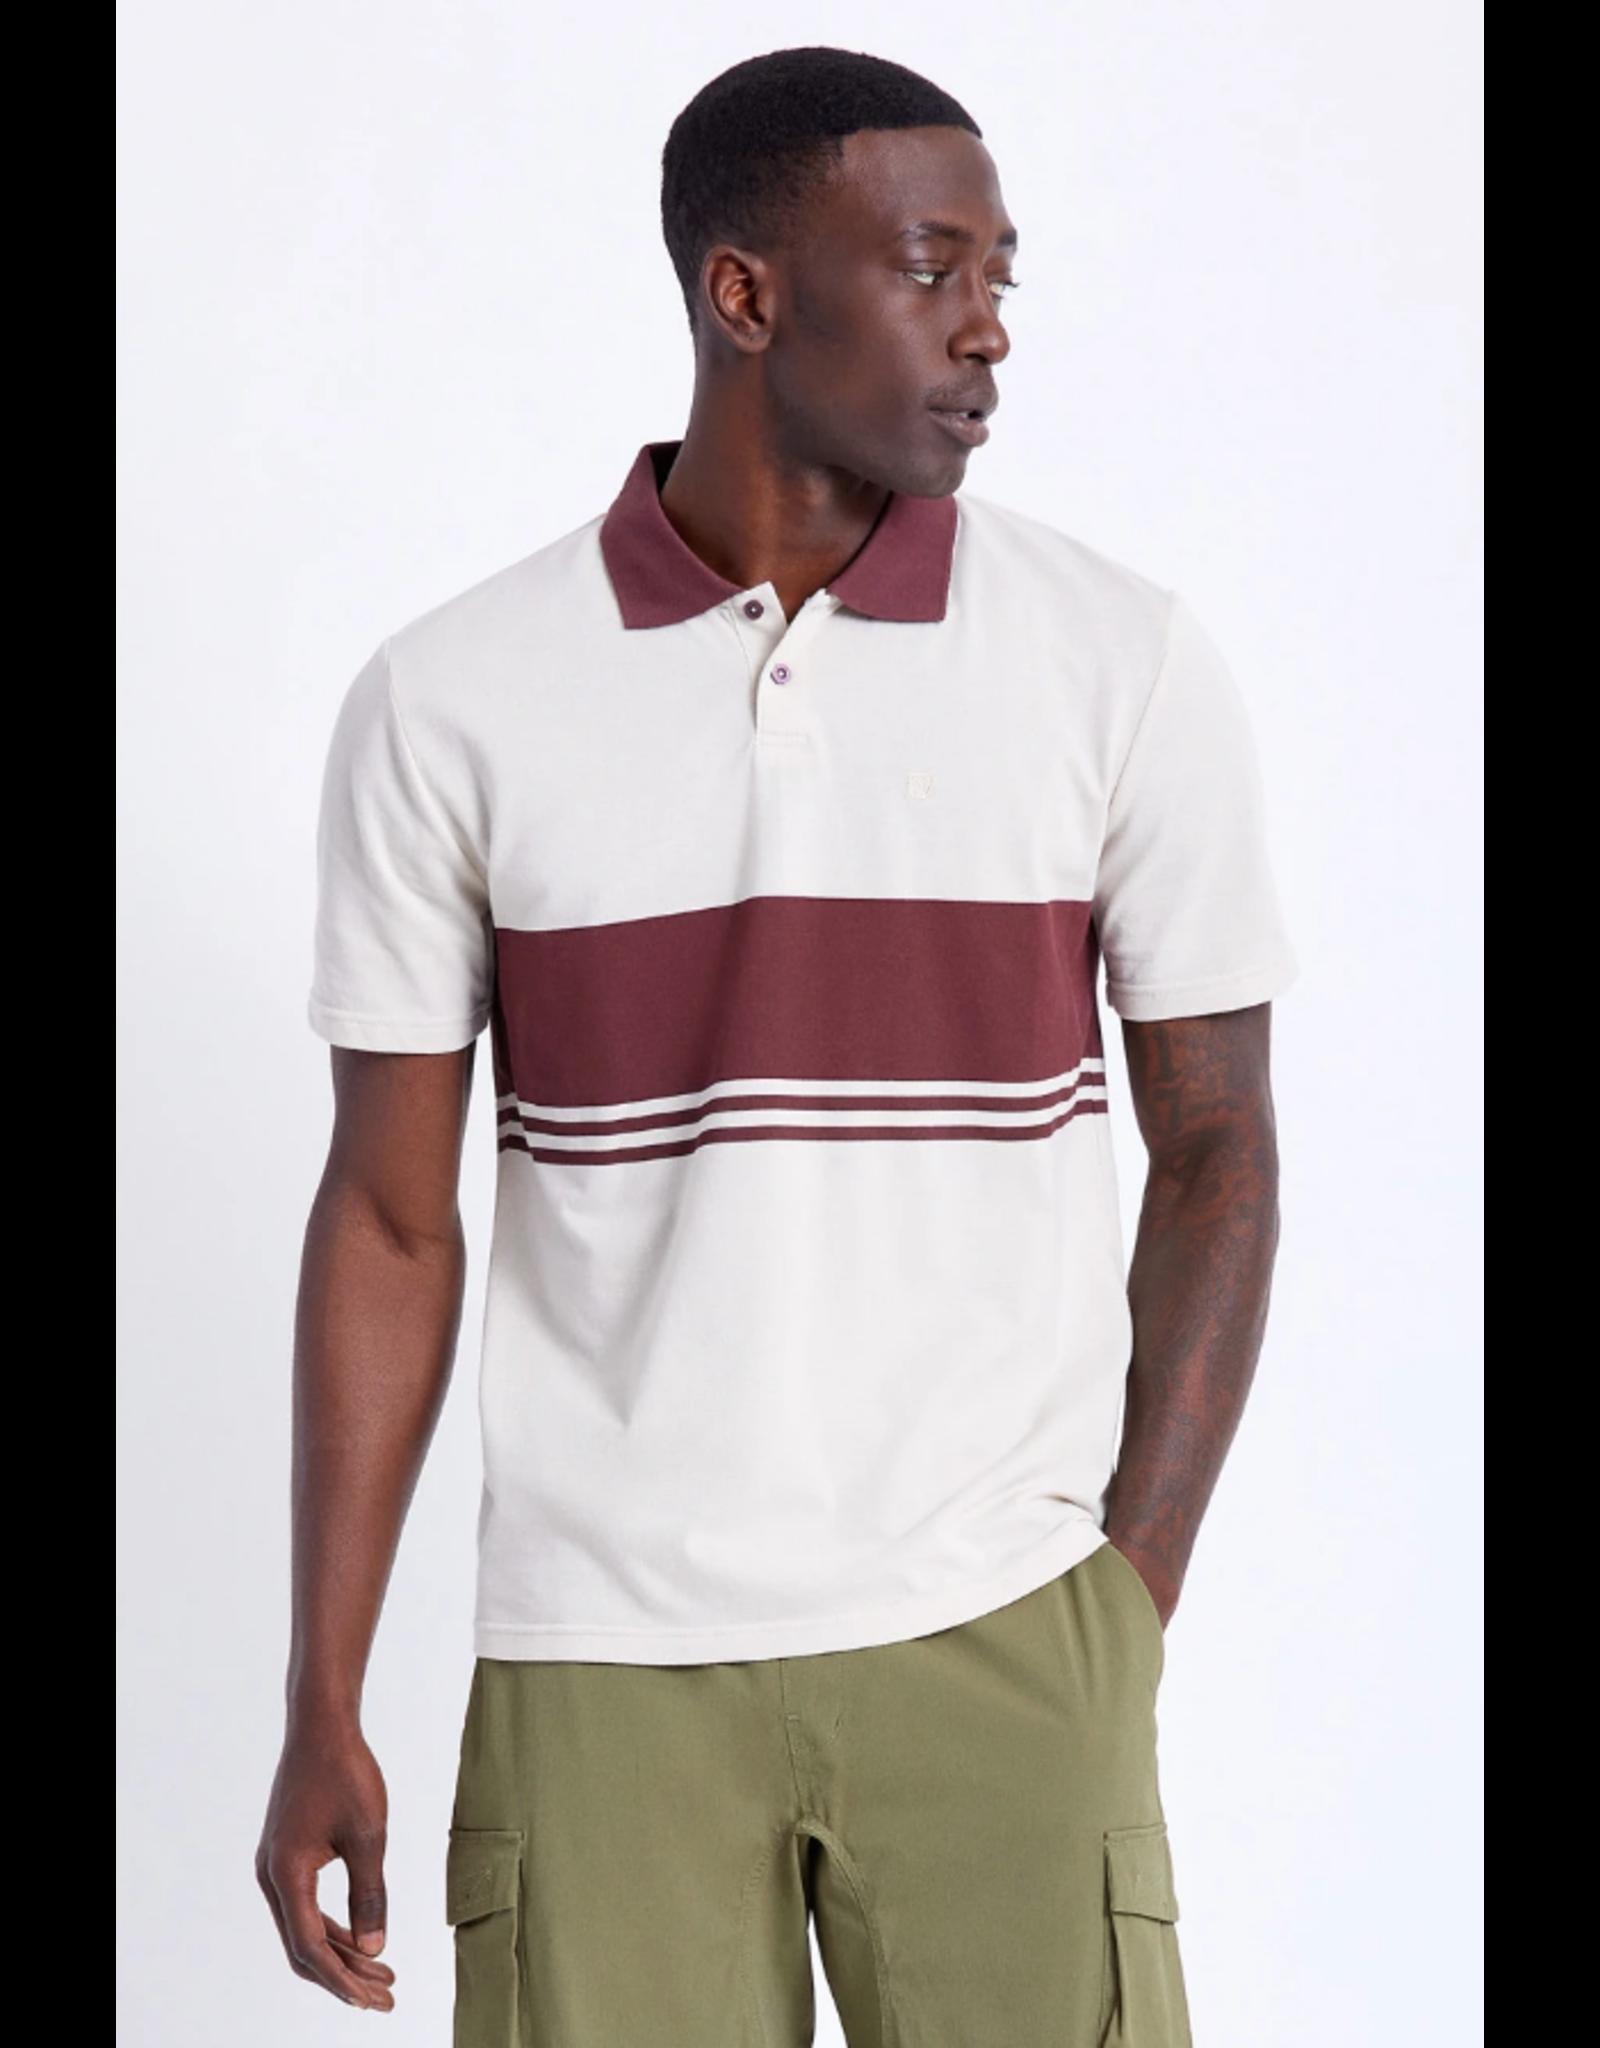 Brixton Shield Stripe S/S Polo Crossover Knit - Beige/Wine